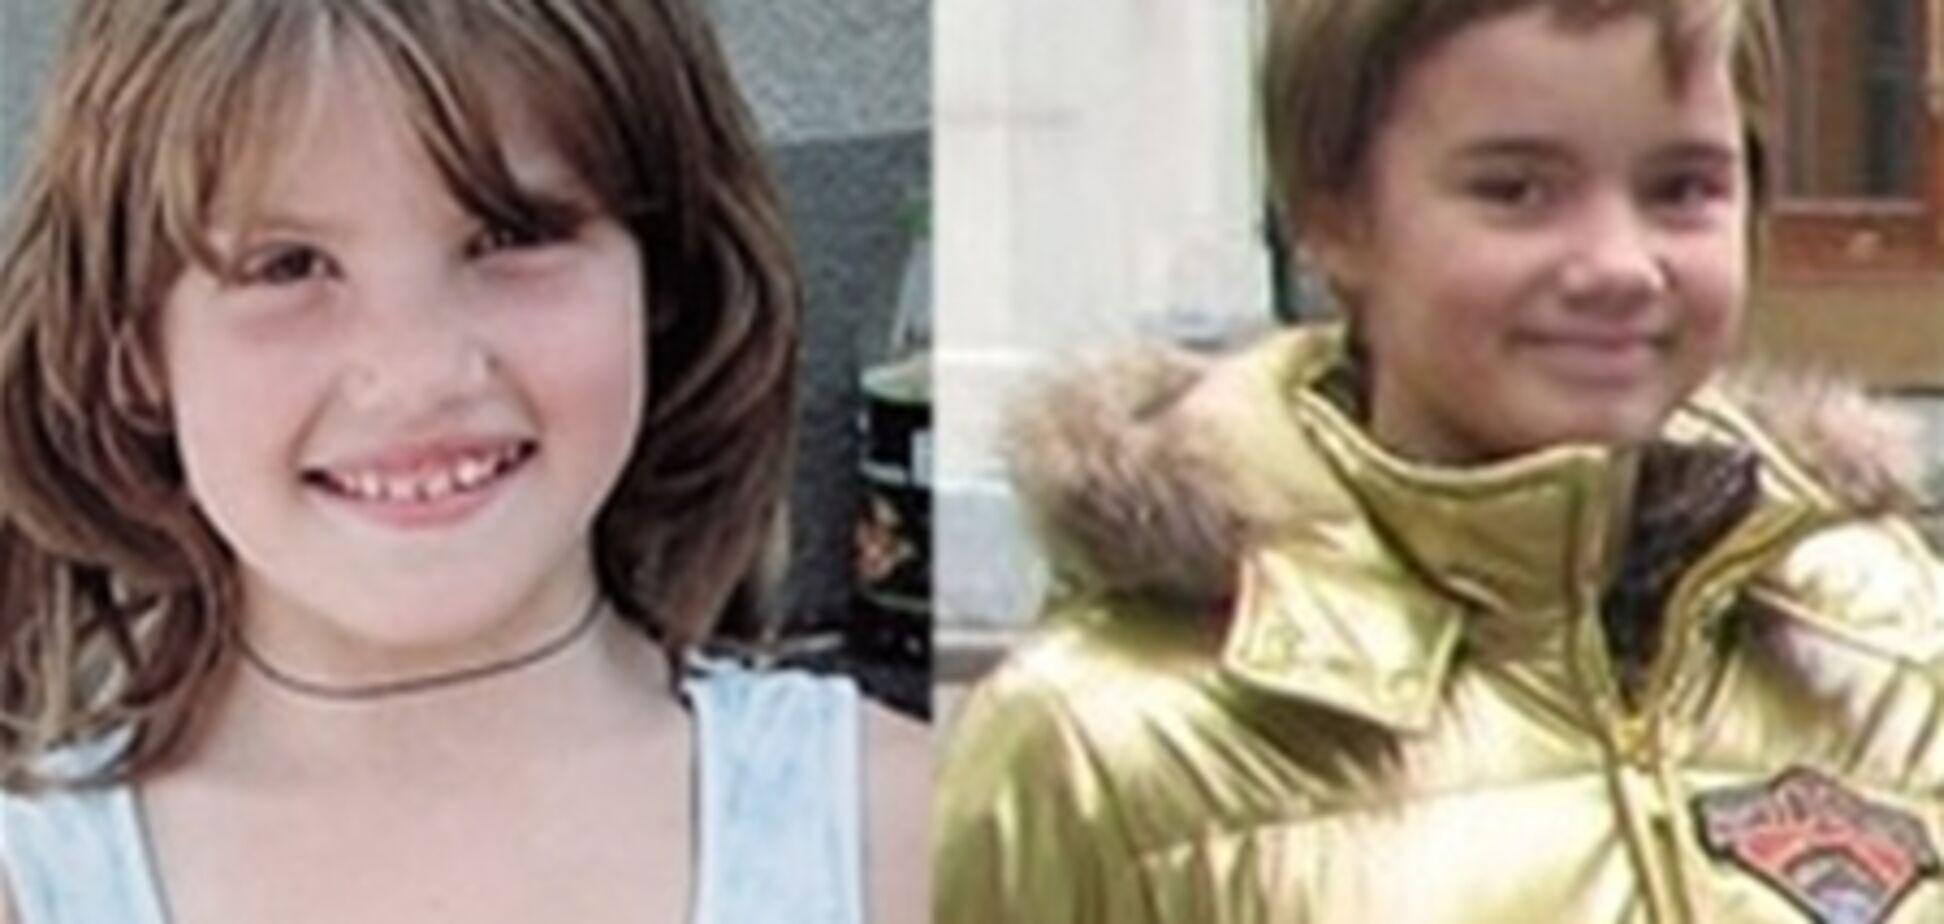 Сторож севастопольського дитсадка дівчаток не вбивав